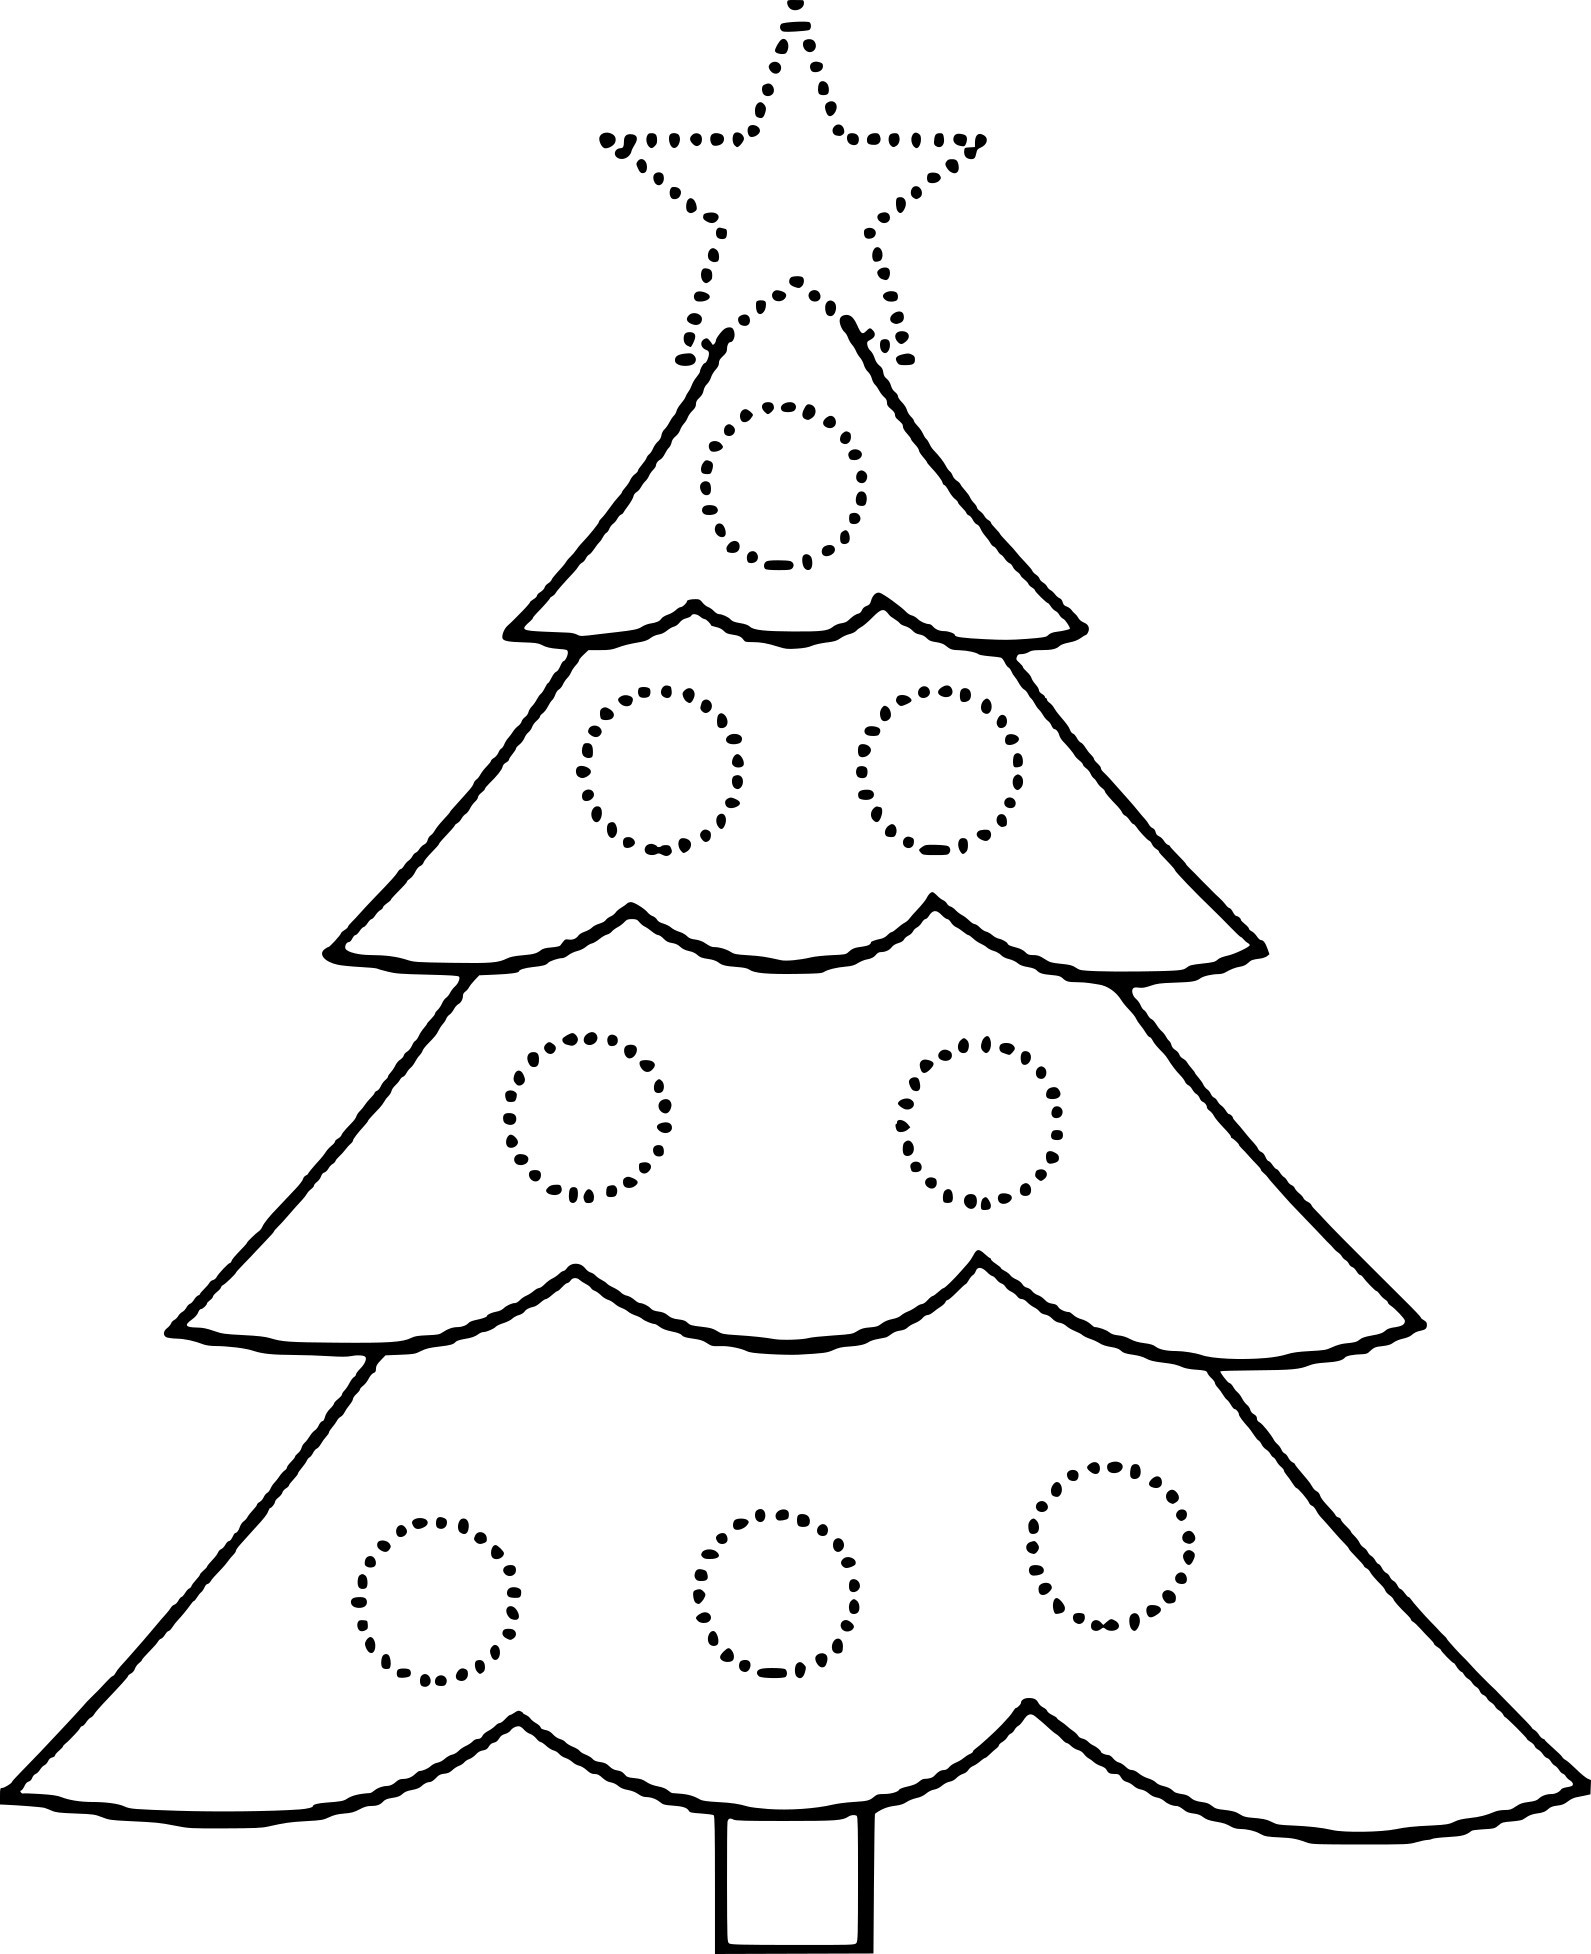 Coloriage Gabarit De Sapin Noël Dessin Gratuit Imprimer destiné Gabarit Sapin De Noel A Imprimer